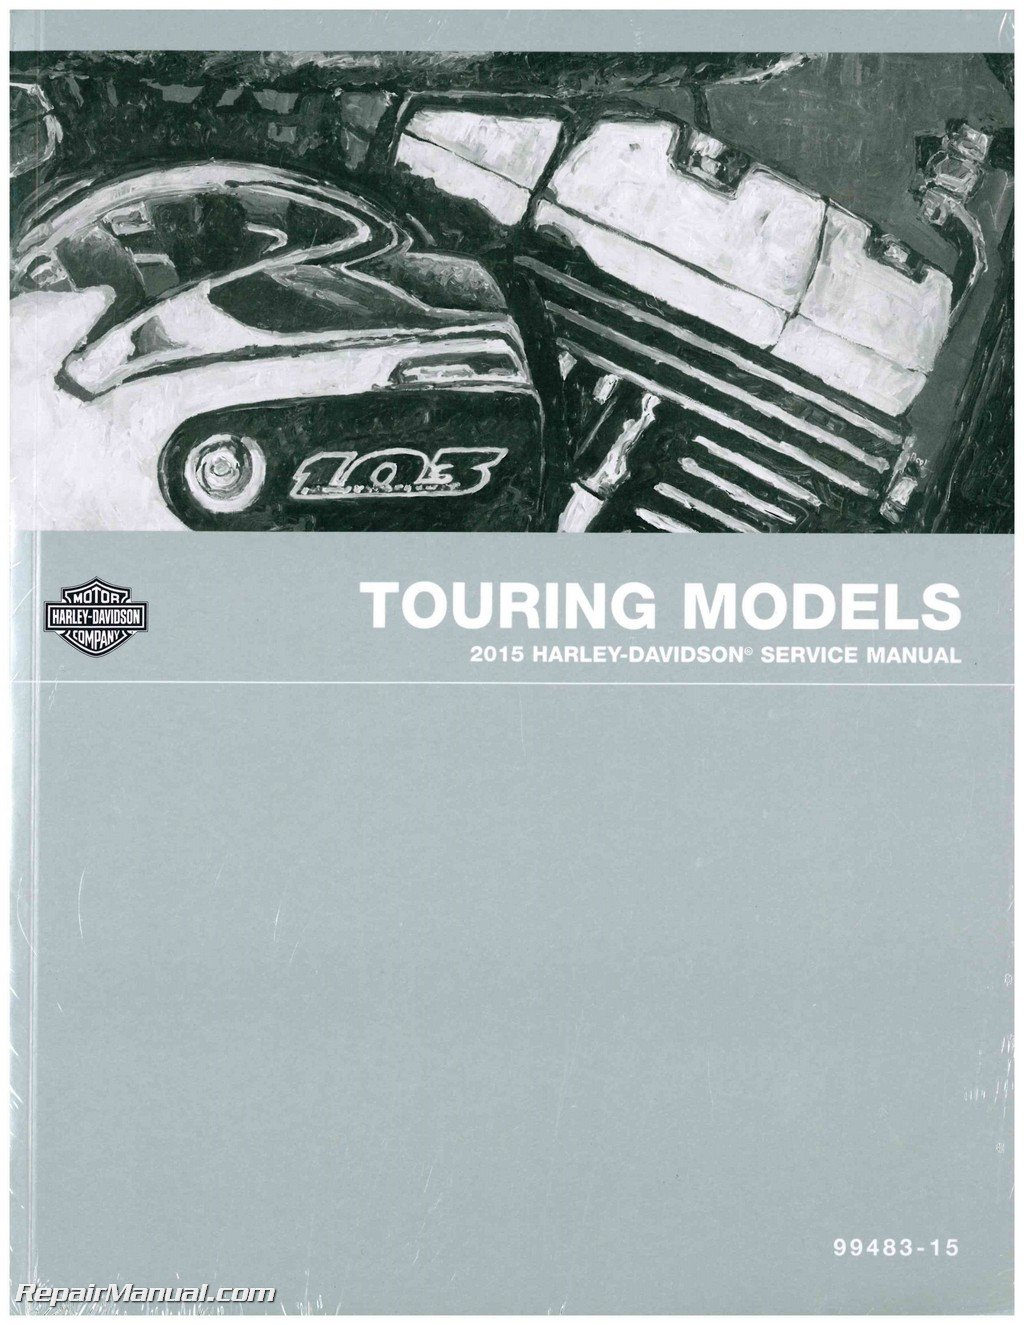 99483-15 2015 Harley Davidson Touring Motorcycle Service Manual:  Manufacturer: Amazon.com: Books